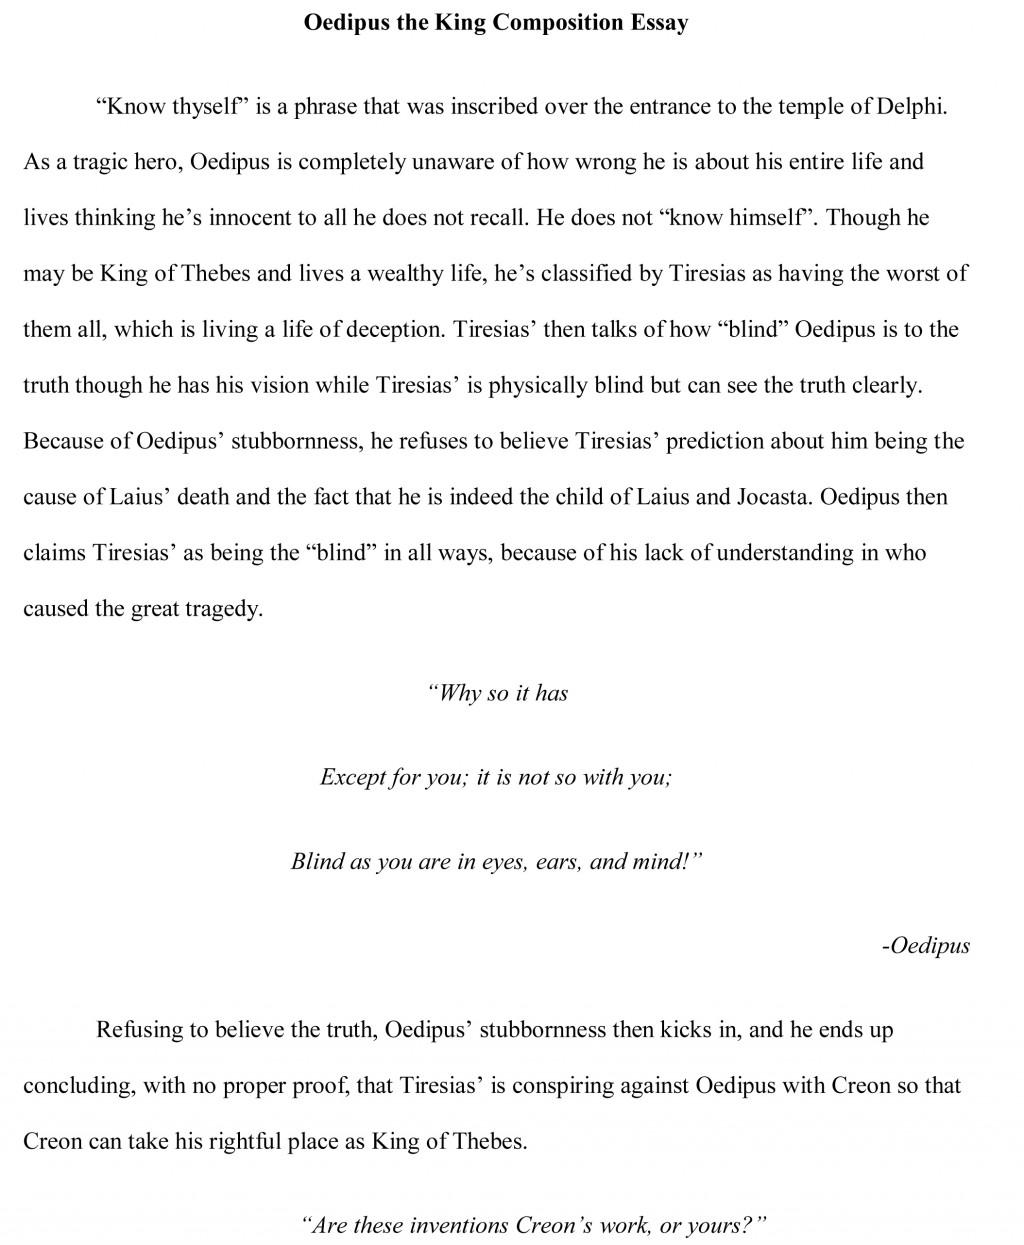 003 Essay Example Oedipus Free Sample Automatic Singular Grader Large